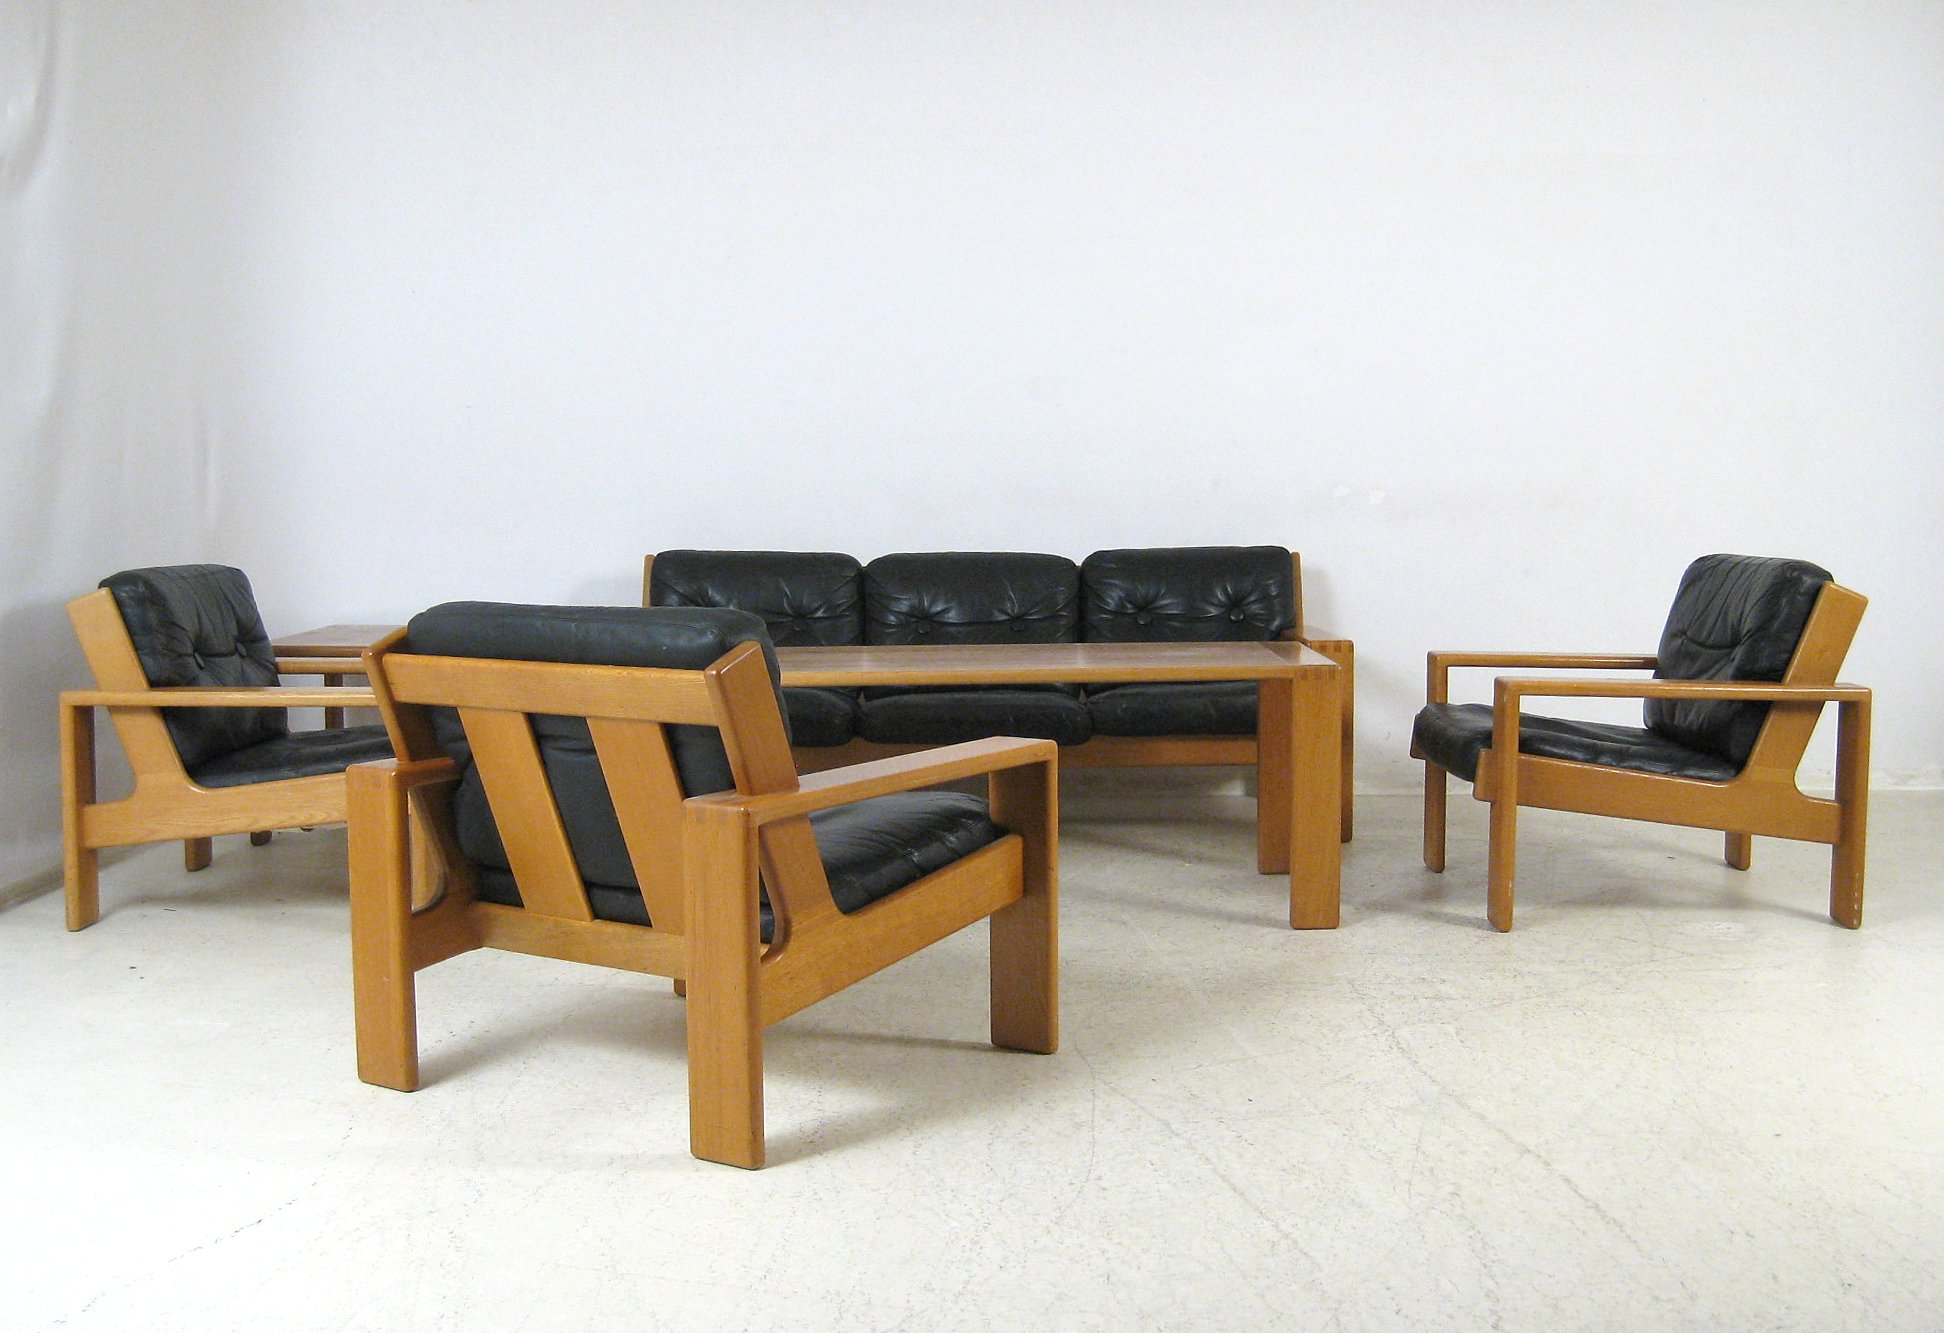 Dreier Sofa auktionstipset lounge suite modell bonanza dreier sofa set